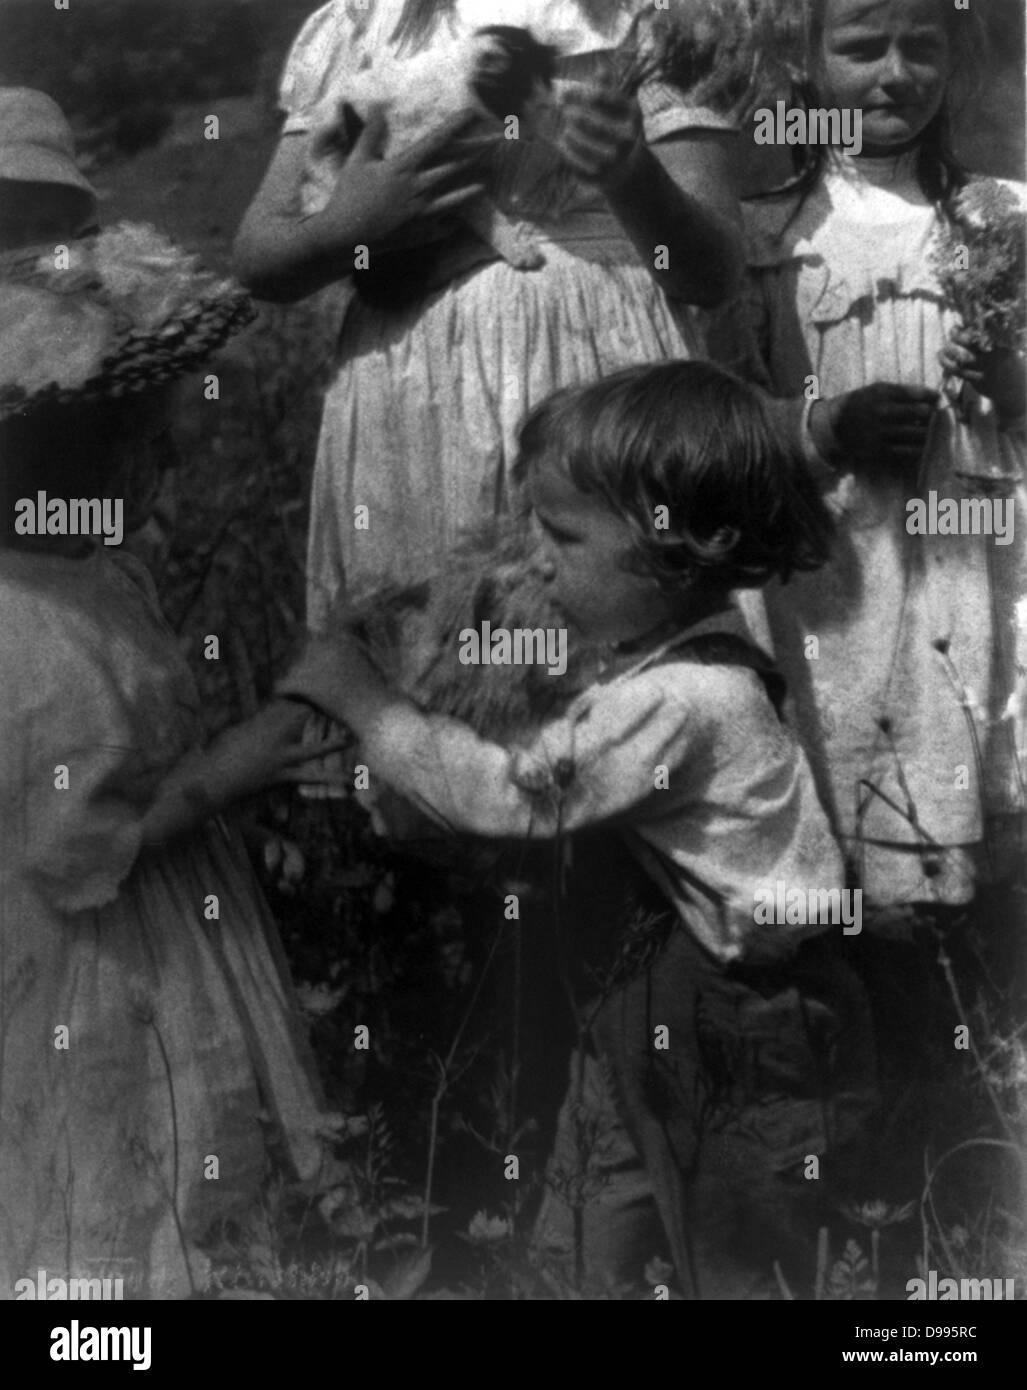 Happy days by  Gertrude Käsebier,  1852-1934, photographer:  Photograph shows four children - Stock Image